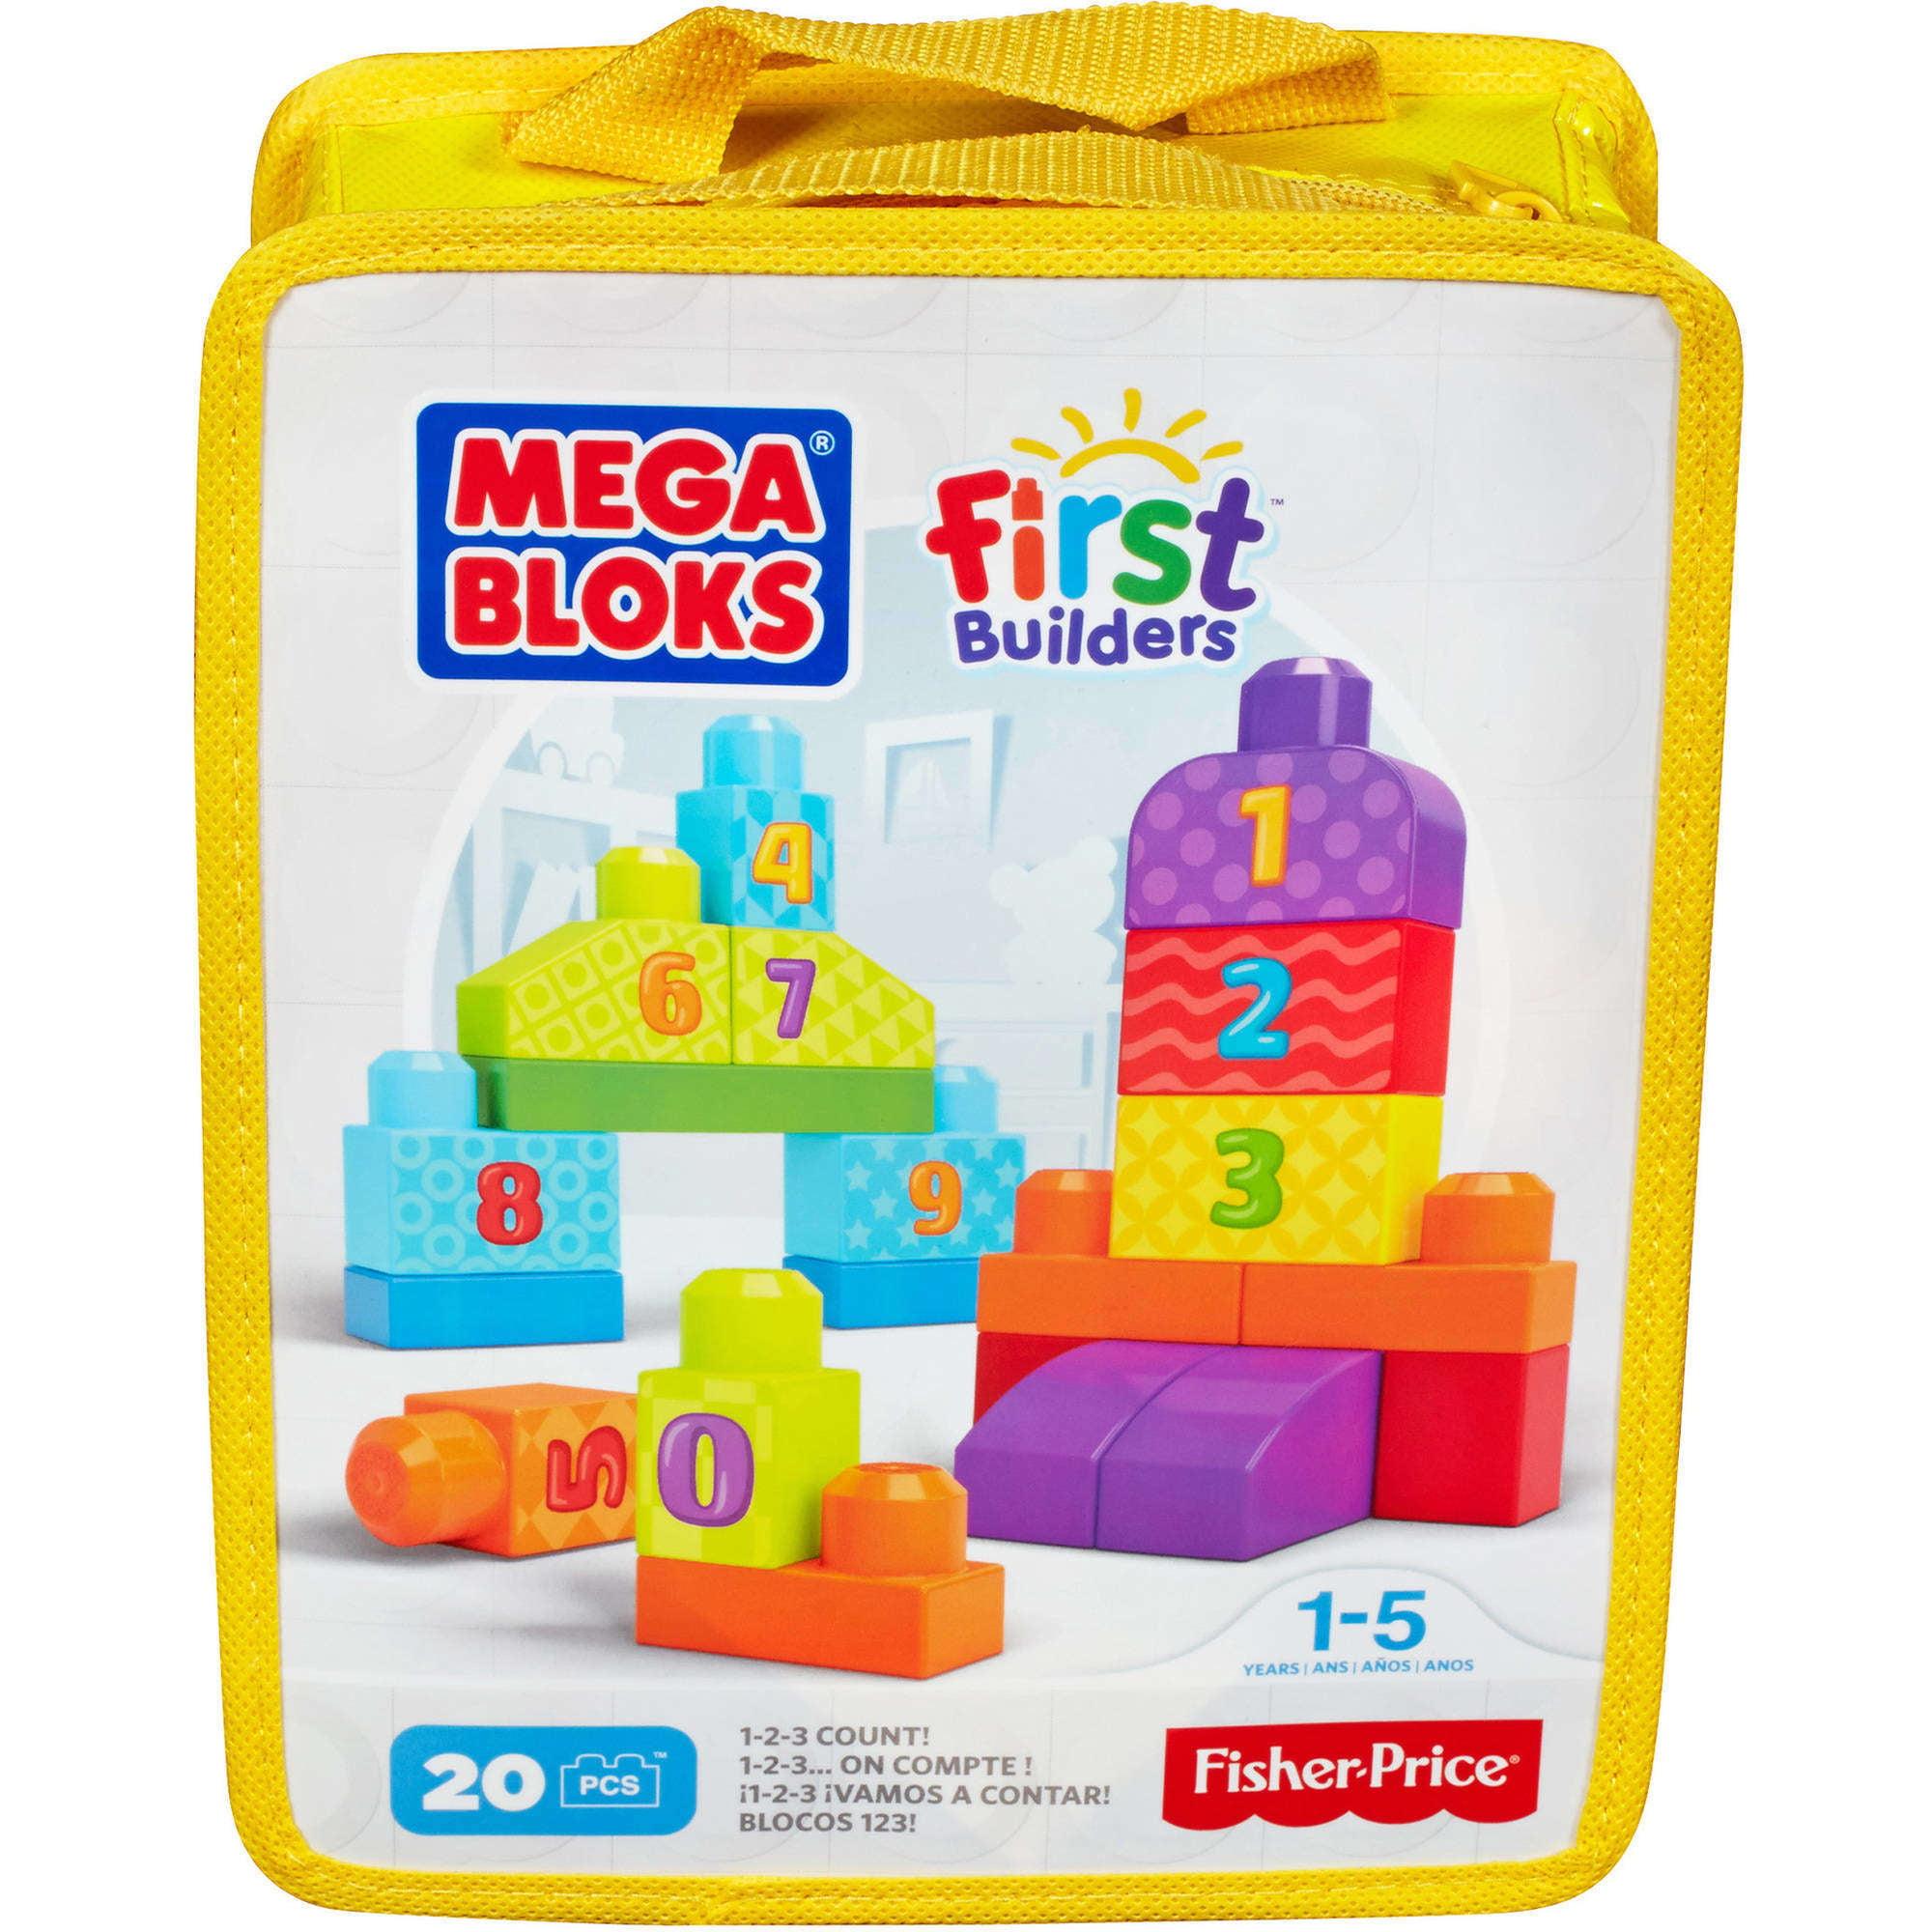 Mega Bloks First Builders 123 Count Playset by MEGA Brands, Inc